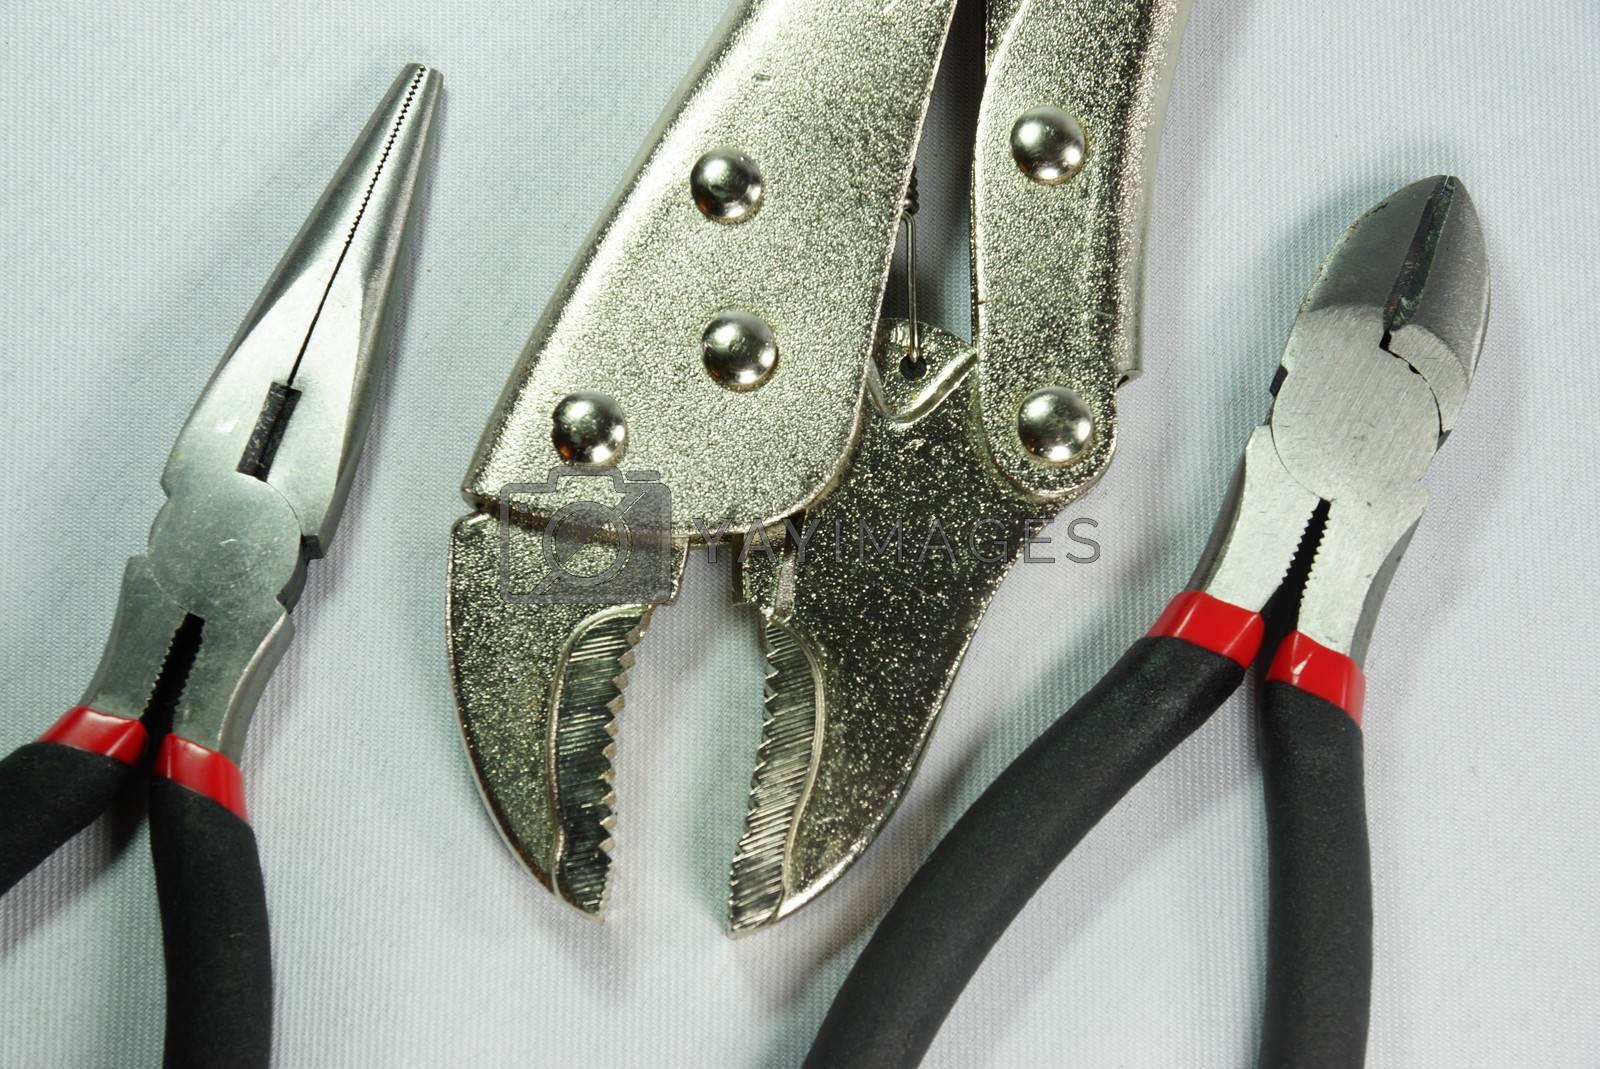 Royalty free image of tools by nattapatt